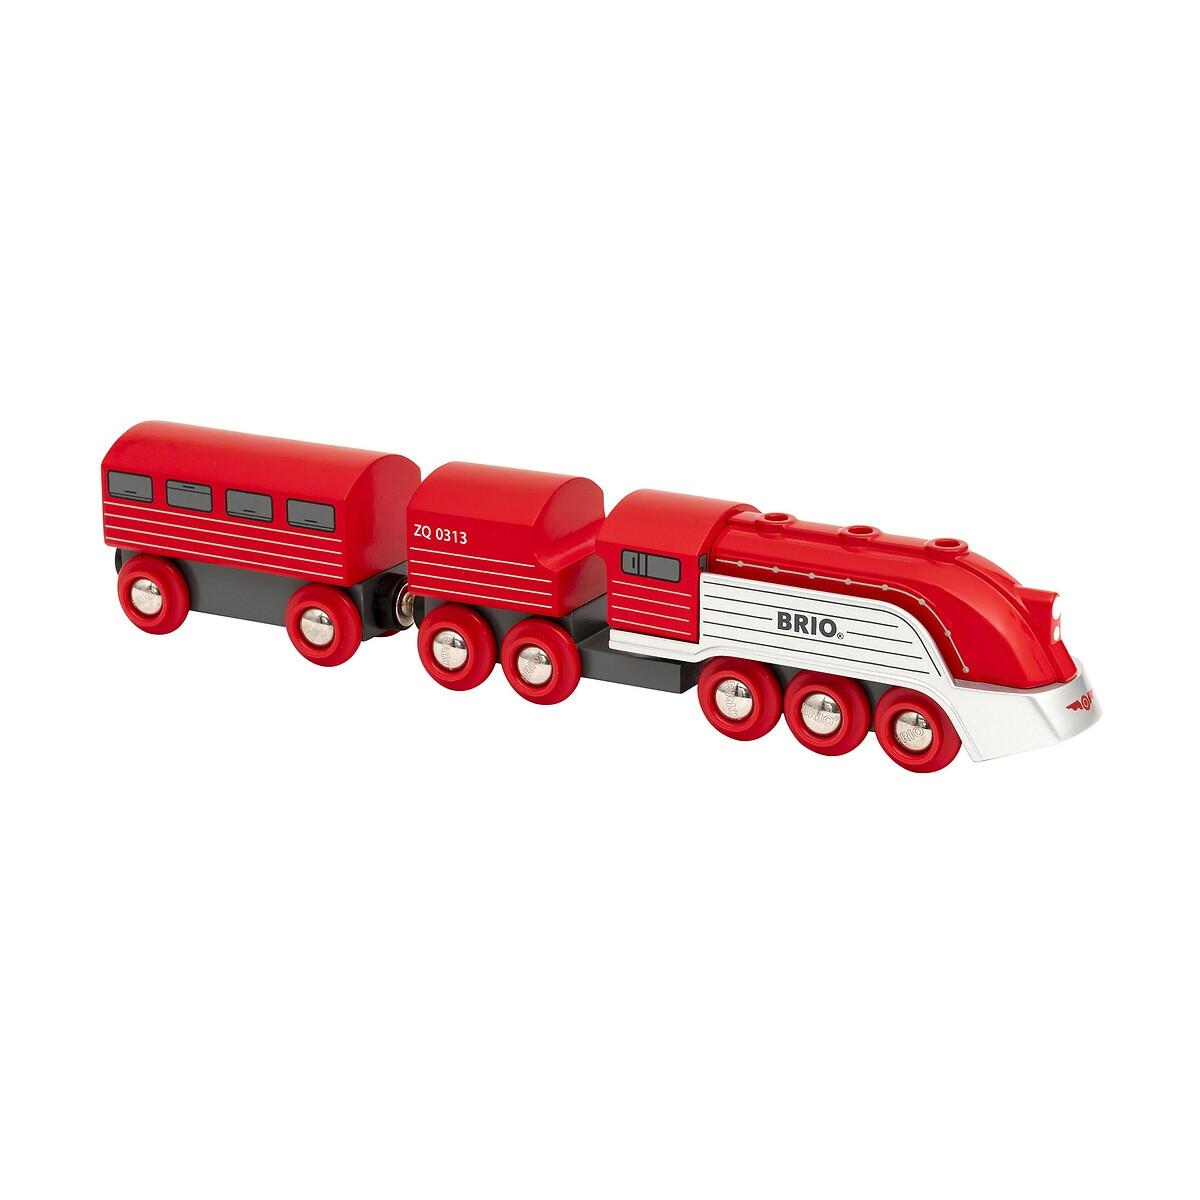 An image of Brio Streamline Train